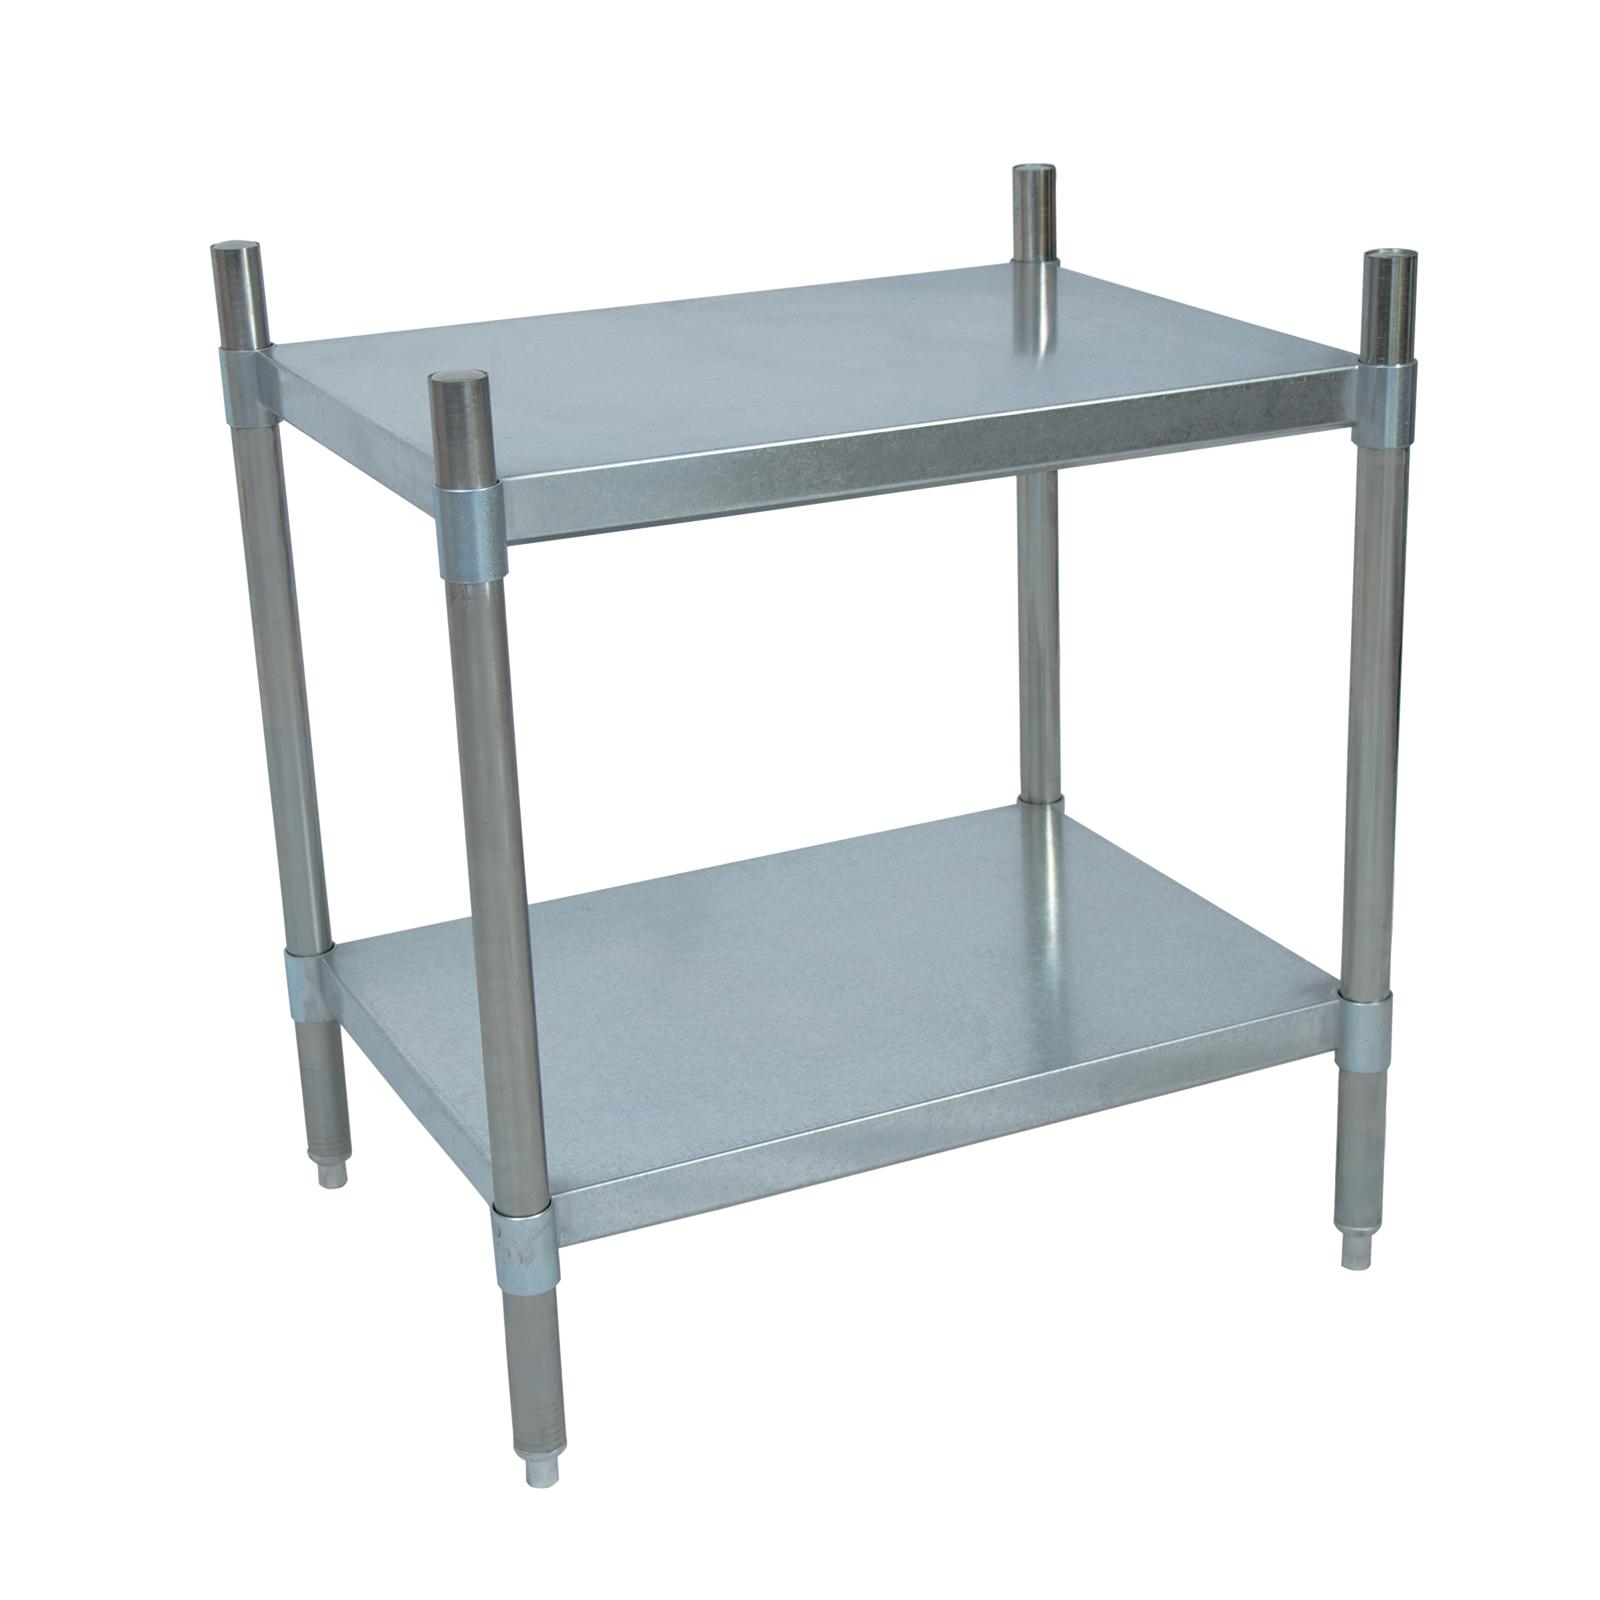 BK Resources SSU3-6724 shelving unit, solid flat